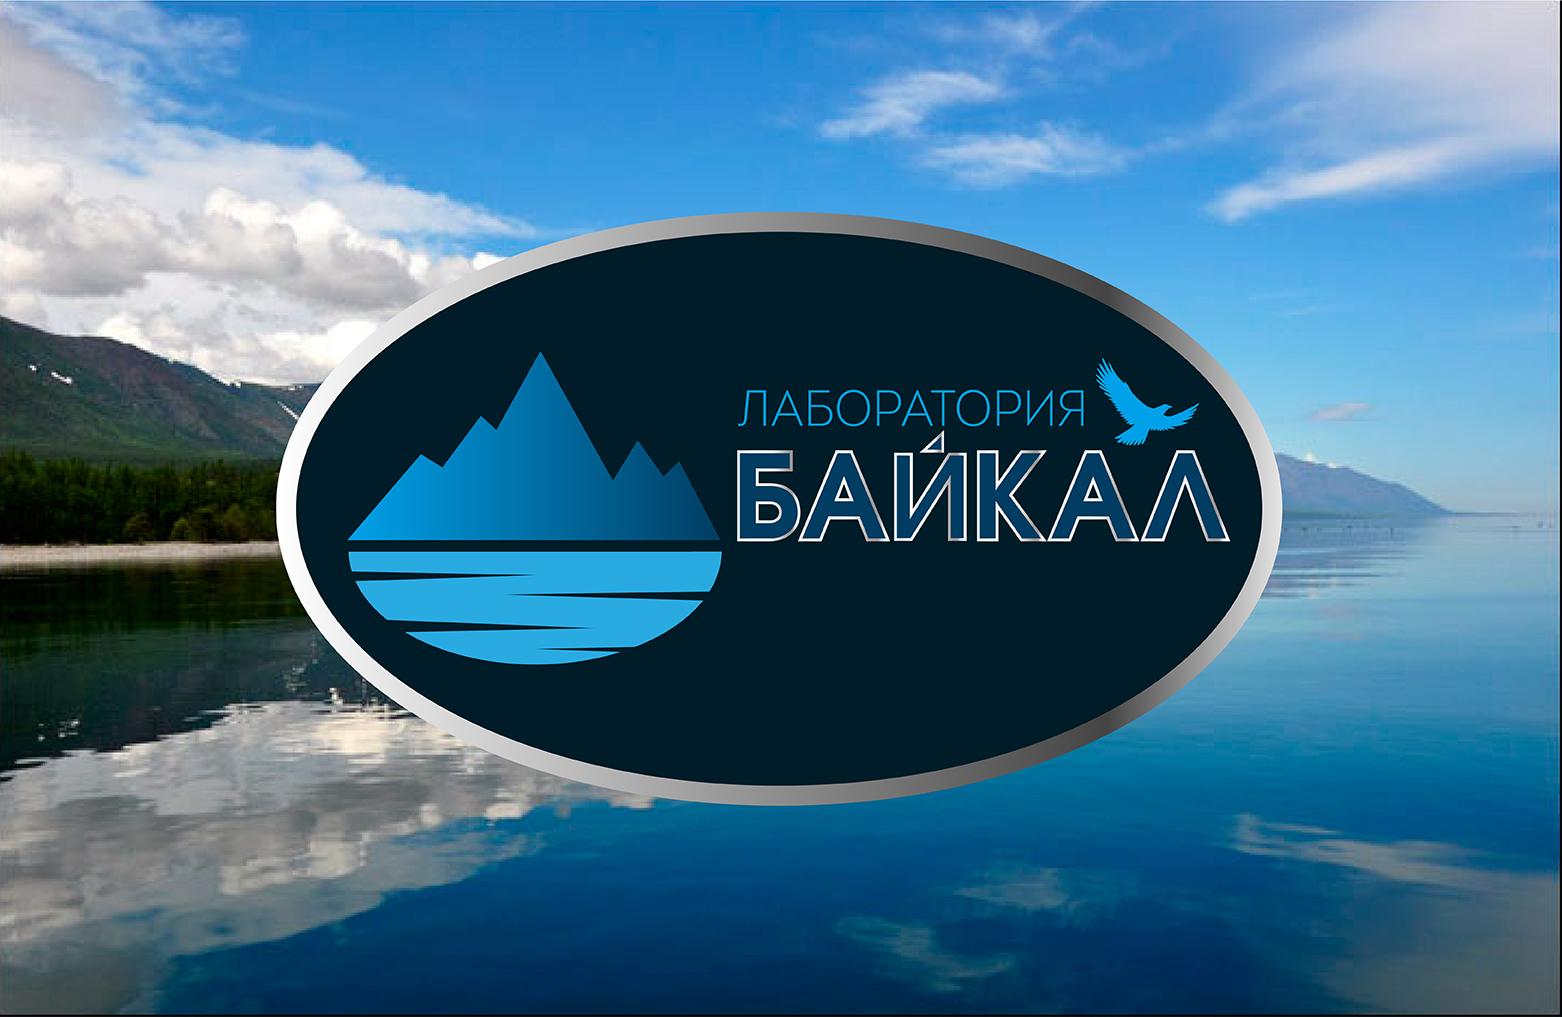 Разработка логотипа торговой марки фото f_904596a838b53172.jpg